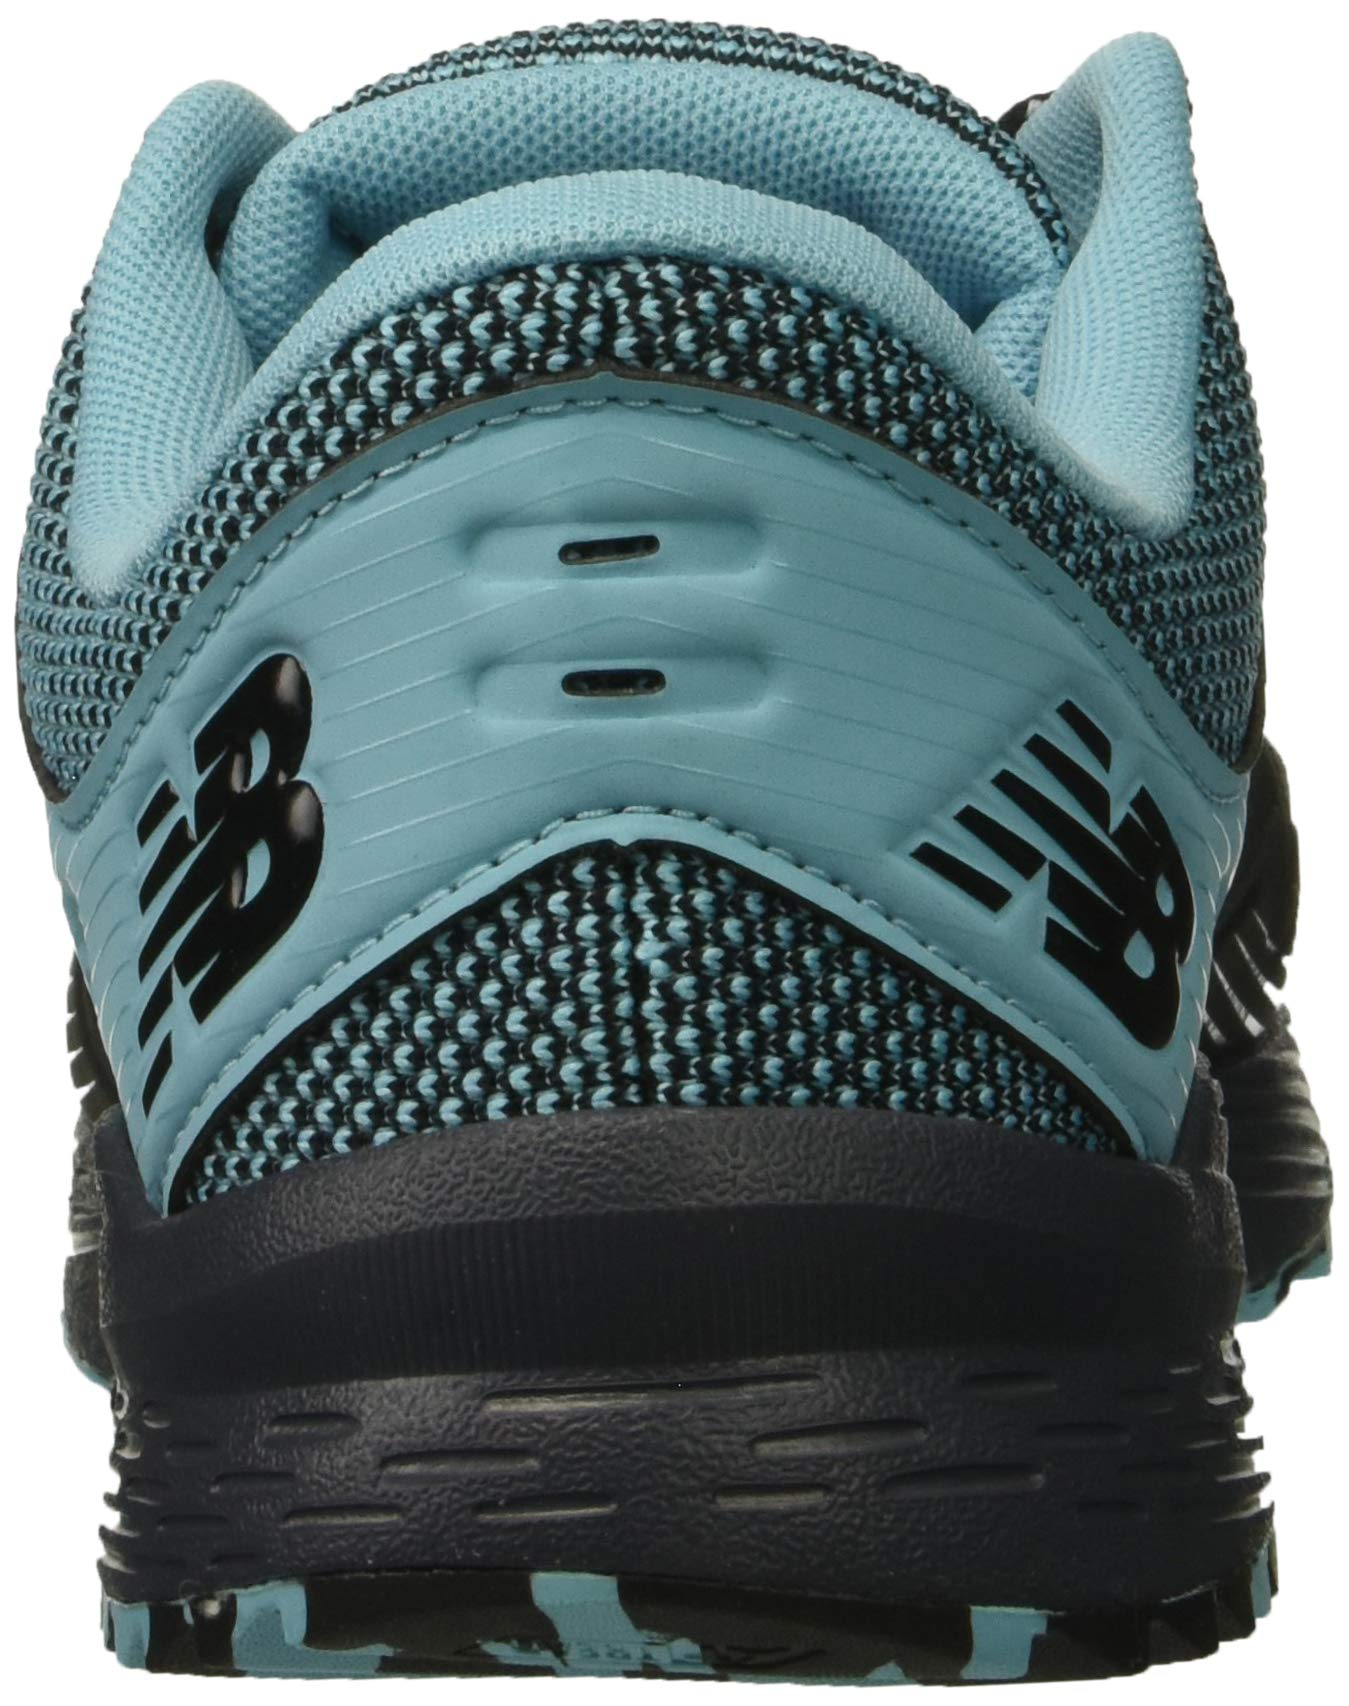 New Balance Women's Nitrel V2 FuelCore Trail Running Shoe, Black/Thunder/Enamel Blue, 6 B US by New Balance (Image #2)